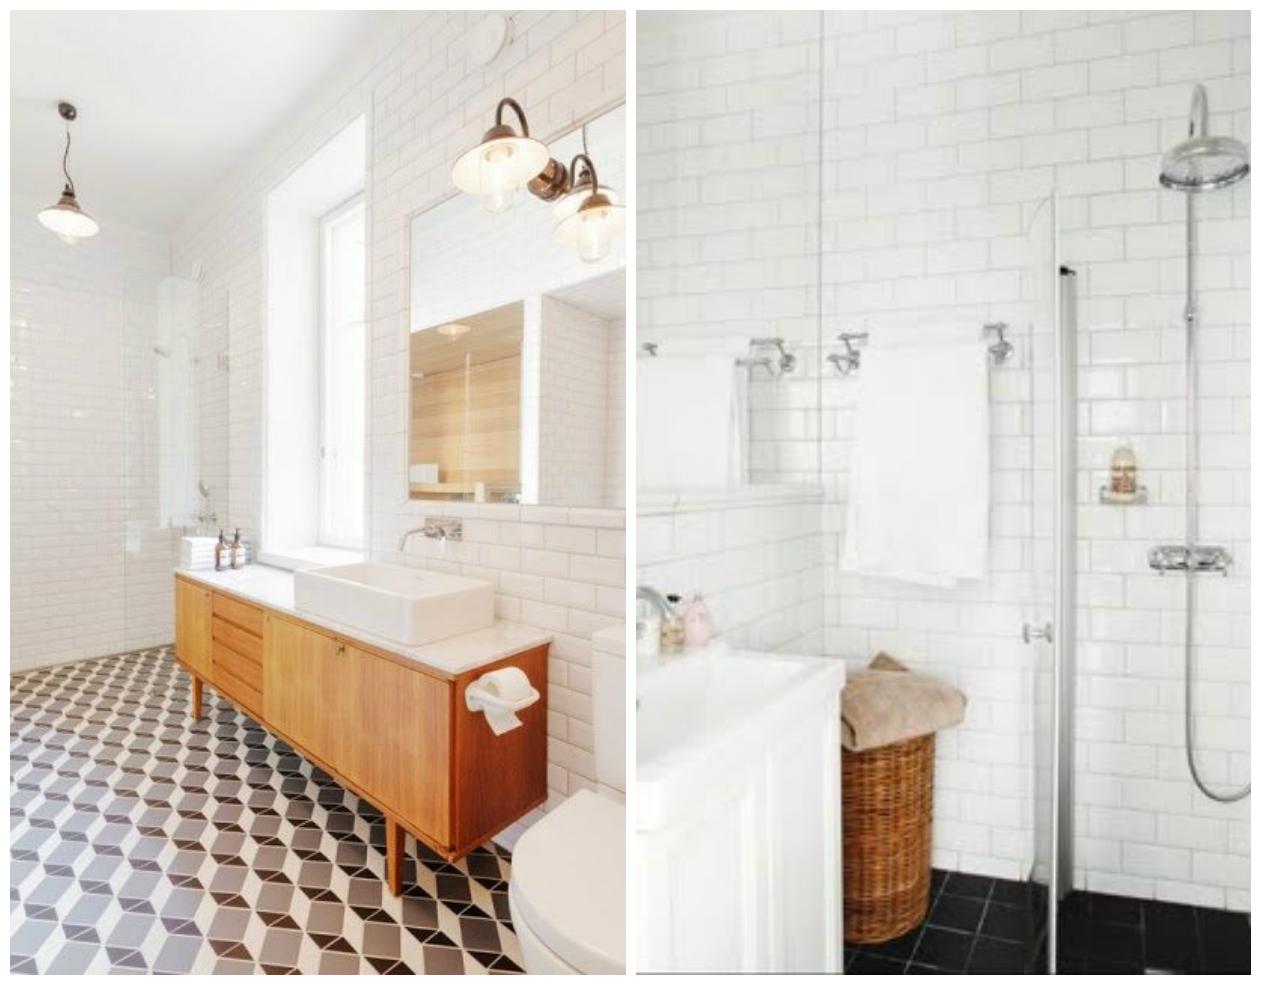 metrotegel badkamer - google zoeken - badkamer | pinterest, Badkamer